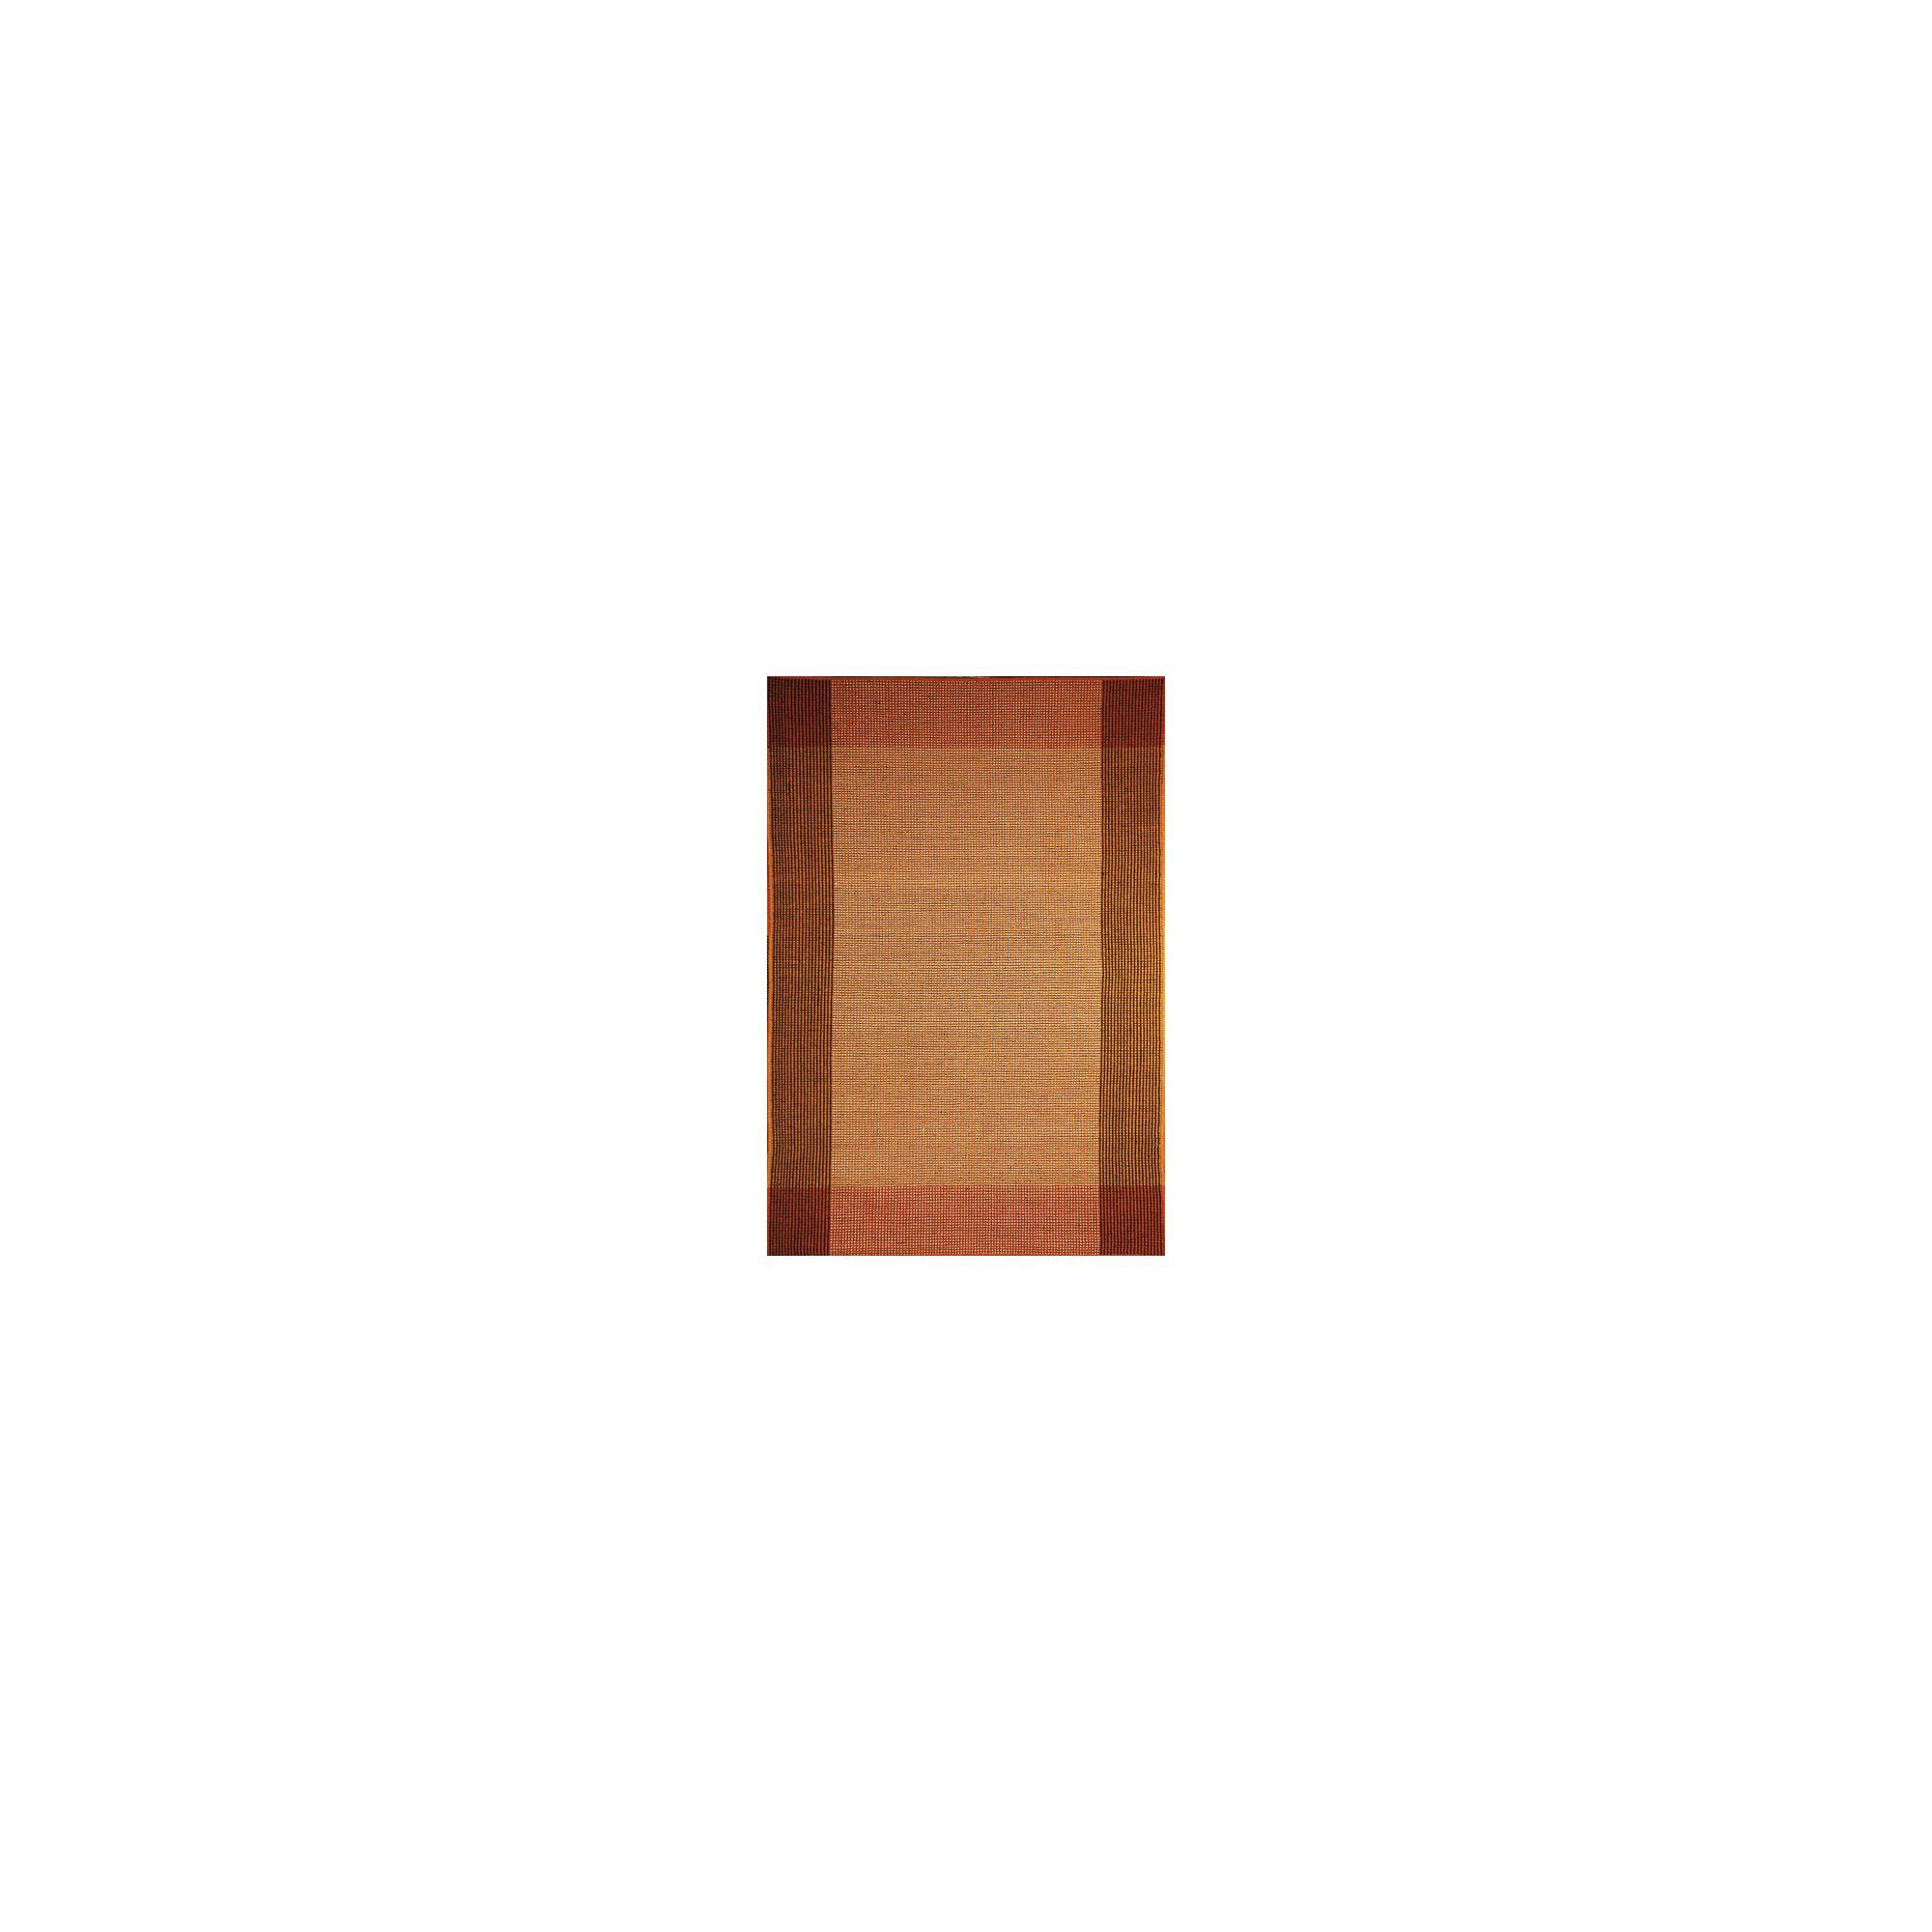 InRUGS Ellora Orange Woven Rug - 200cm x 140cm (6 ft 6.5 in x 4 ft 7 in)